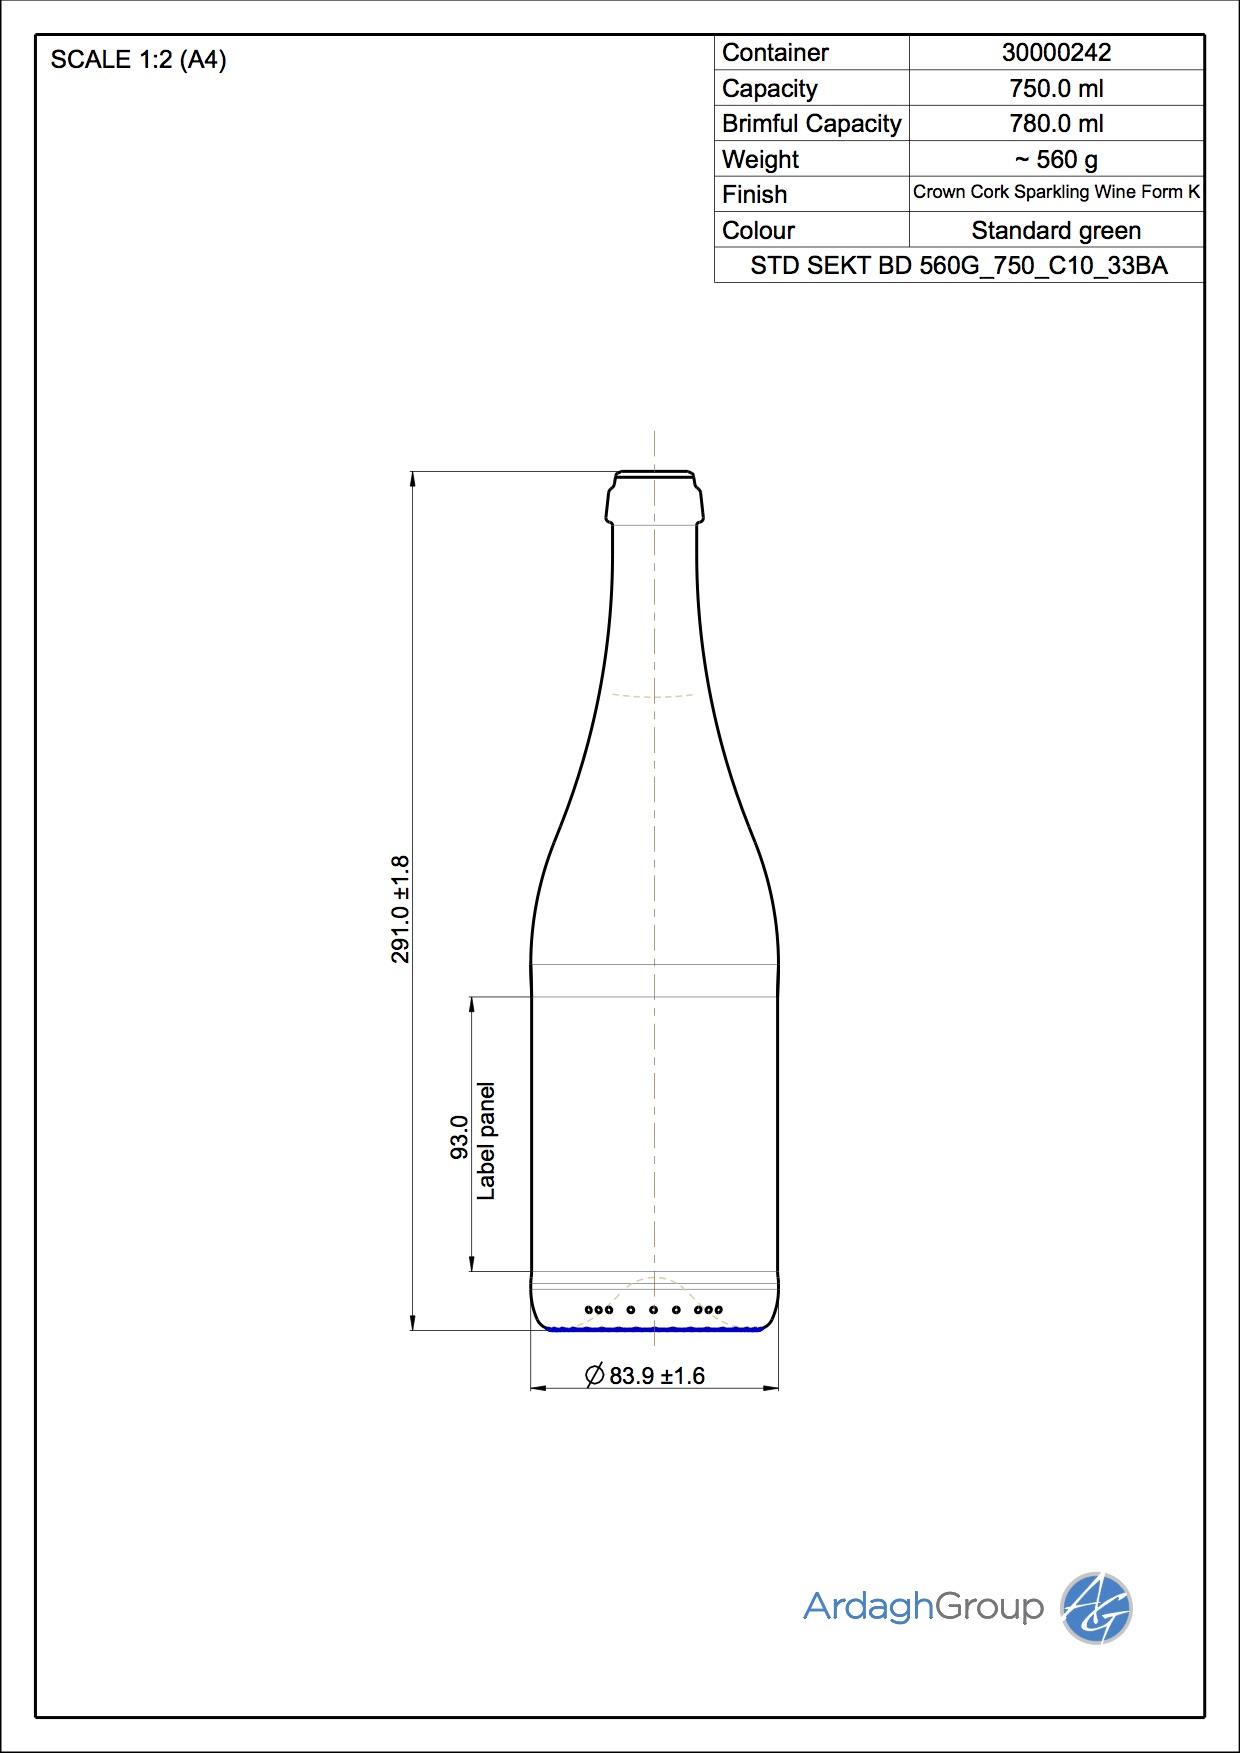 750ml Green Glass Sekt Wine Bottle 30000242